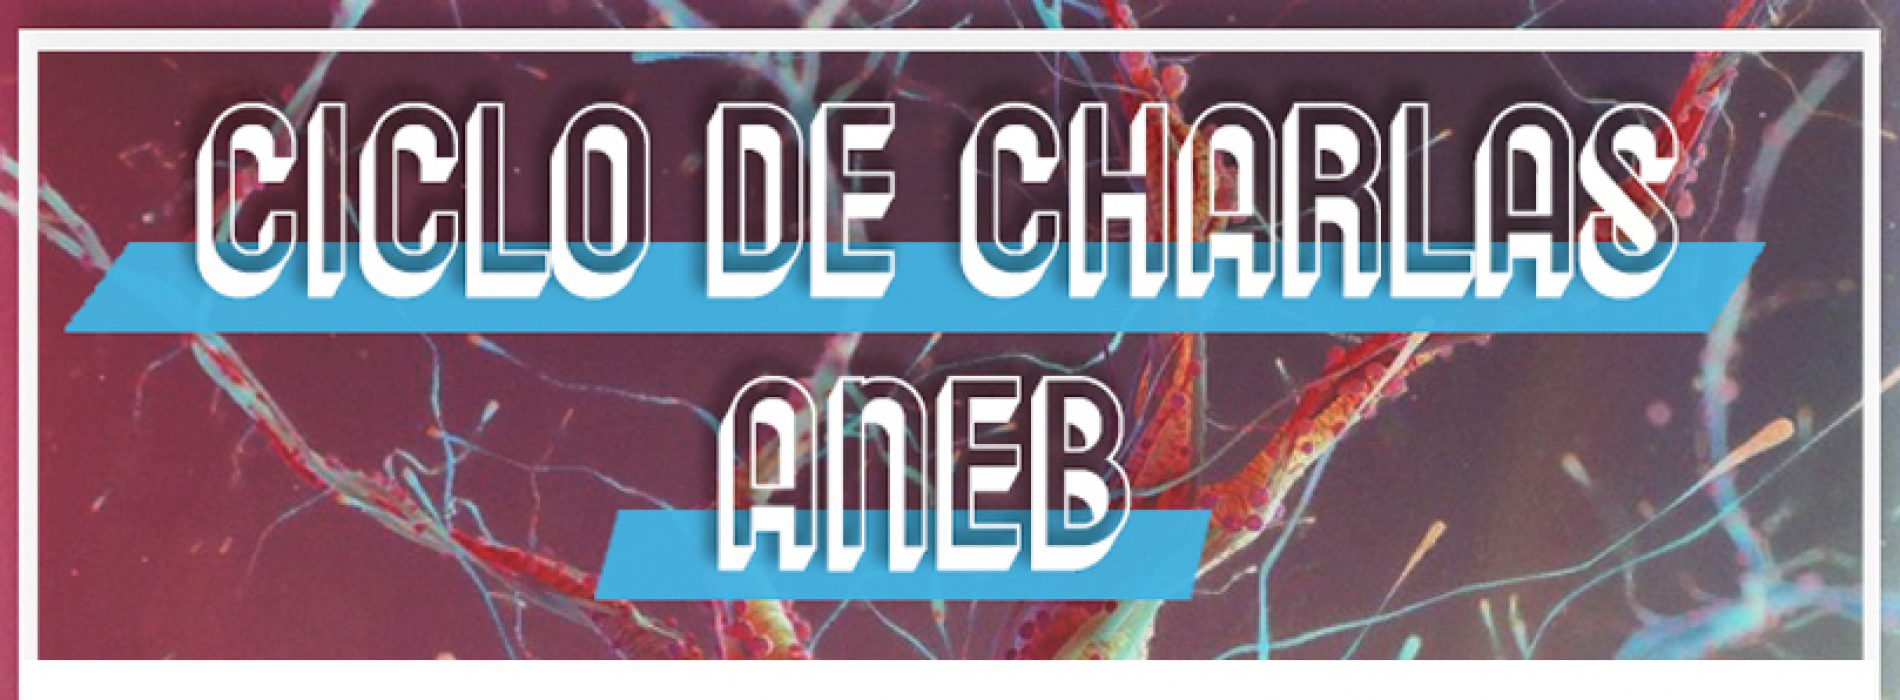 Ciclo de Charlas ANEB – Foro de difusión científica